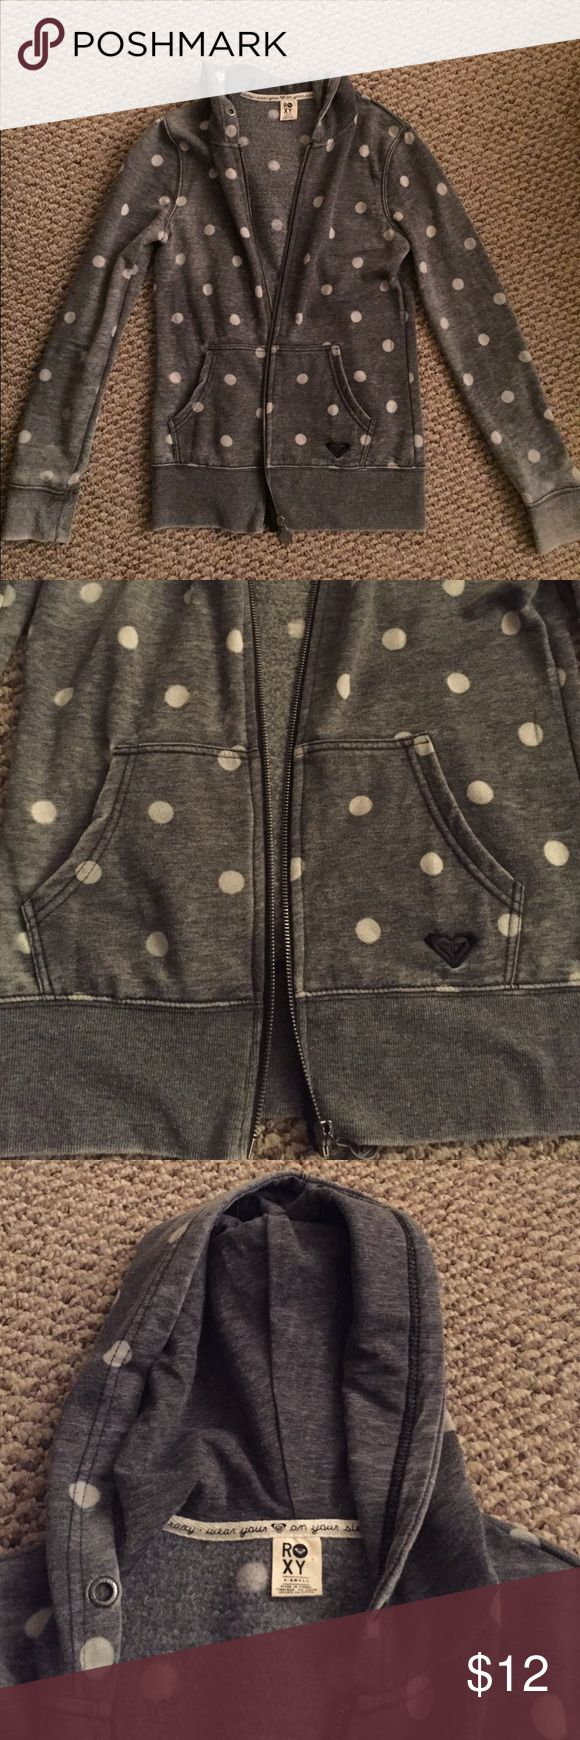 Roxy zip up hoodie Roxy grey polka dot zip up hoodie Roxy Tops Sweatshirts & Hoodies